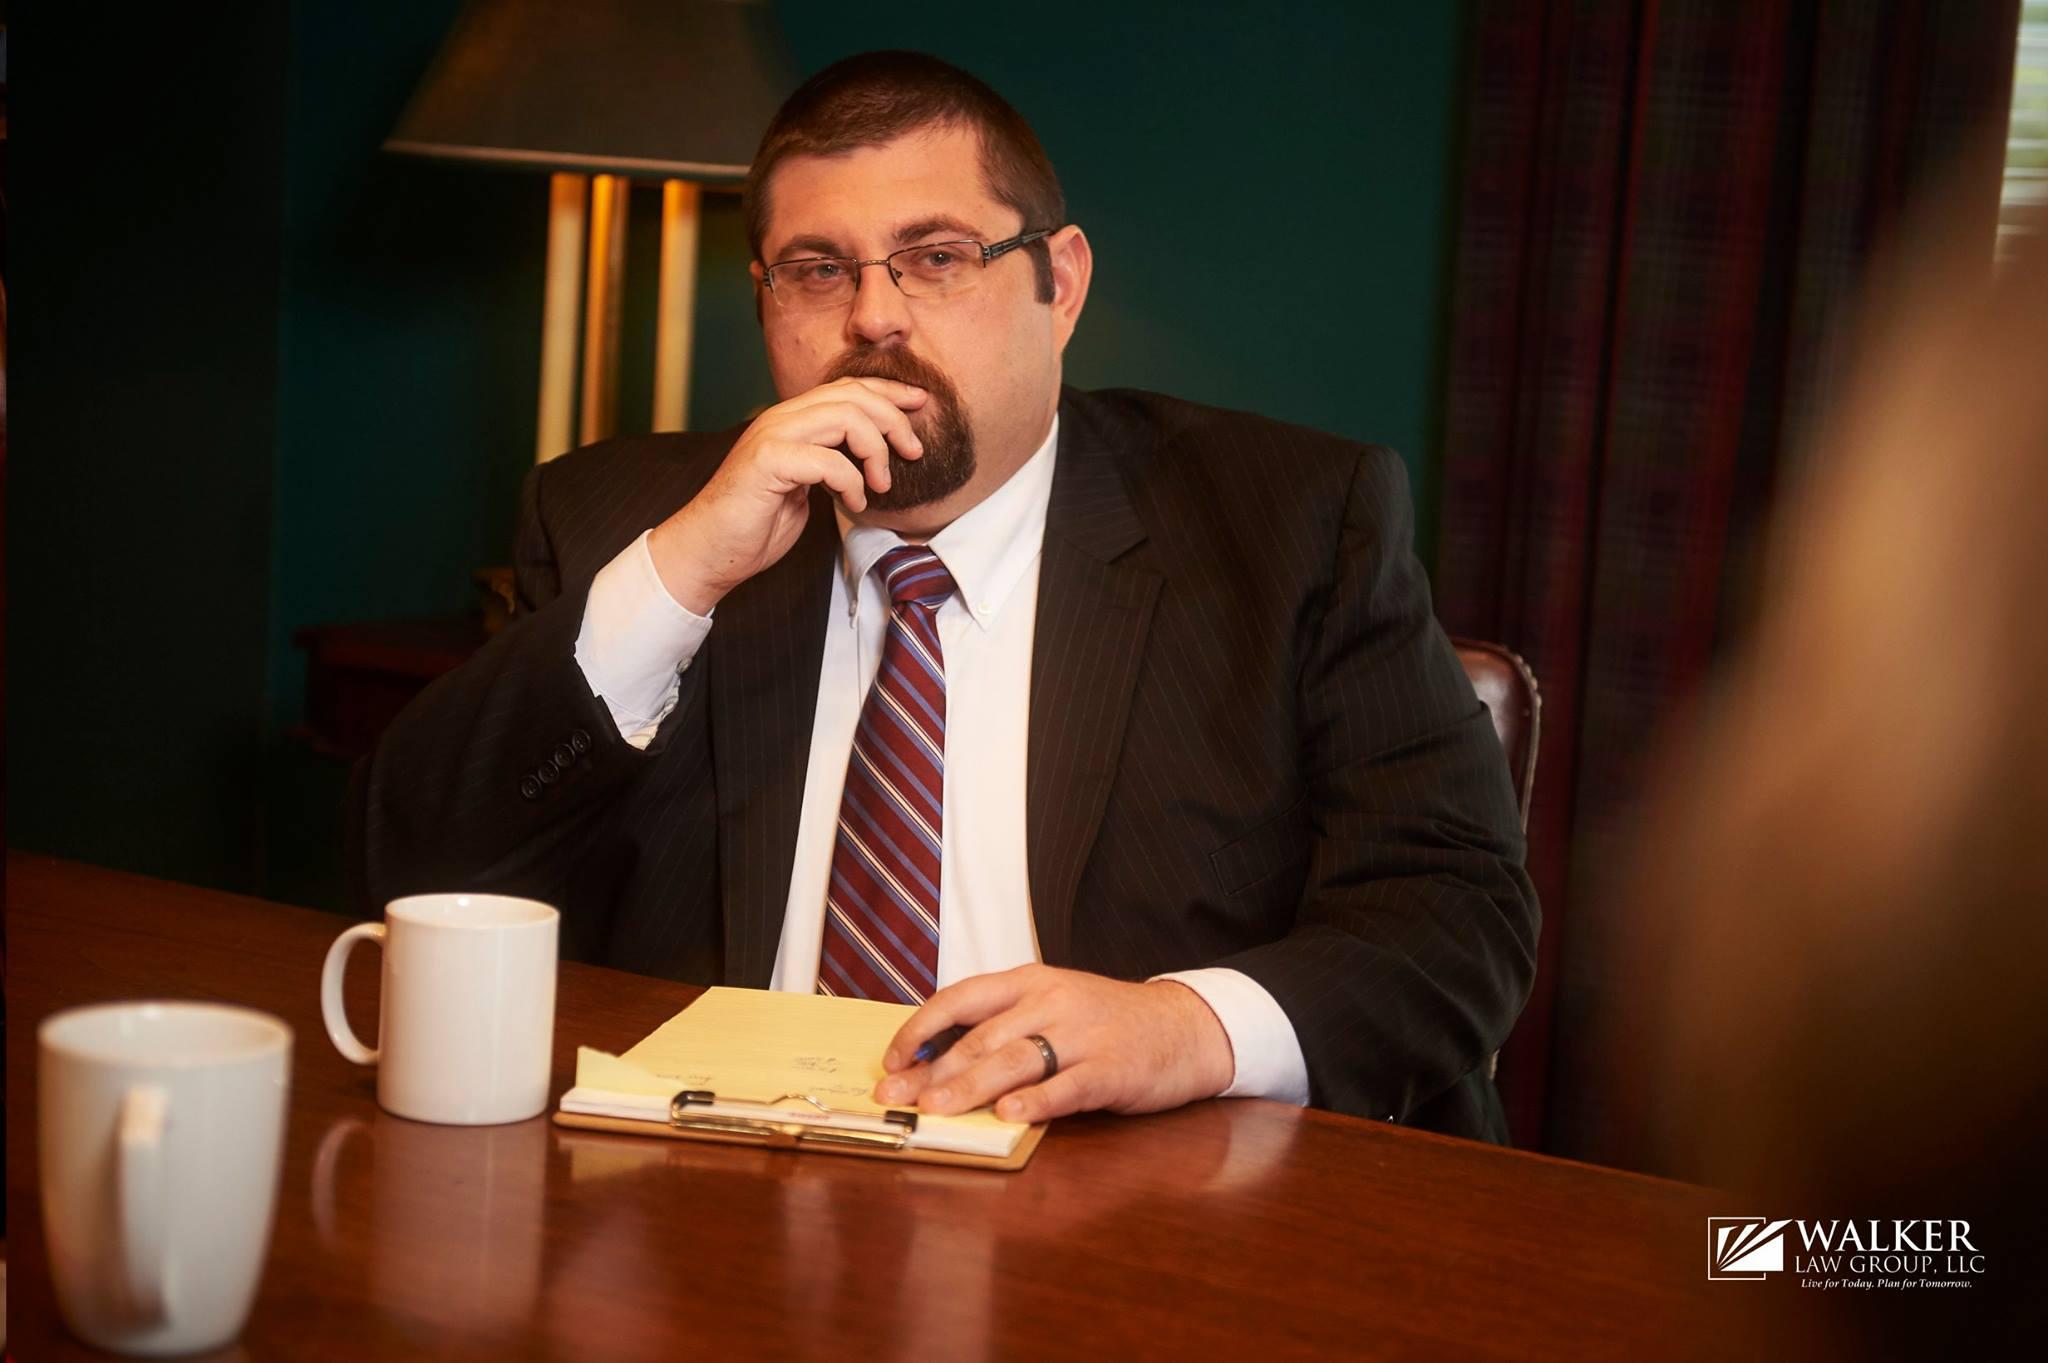 Jared Price - Walker Law Group